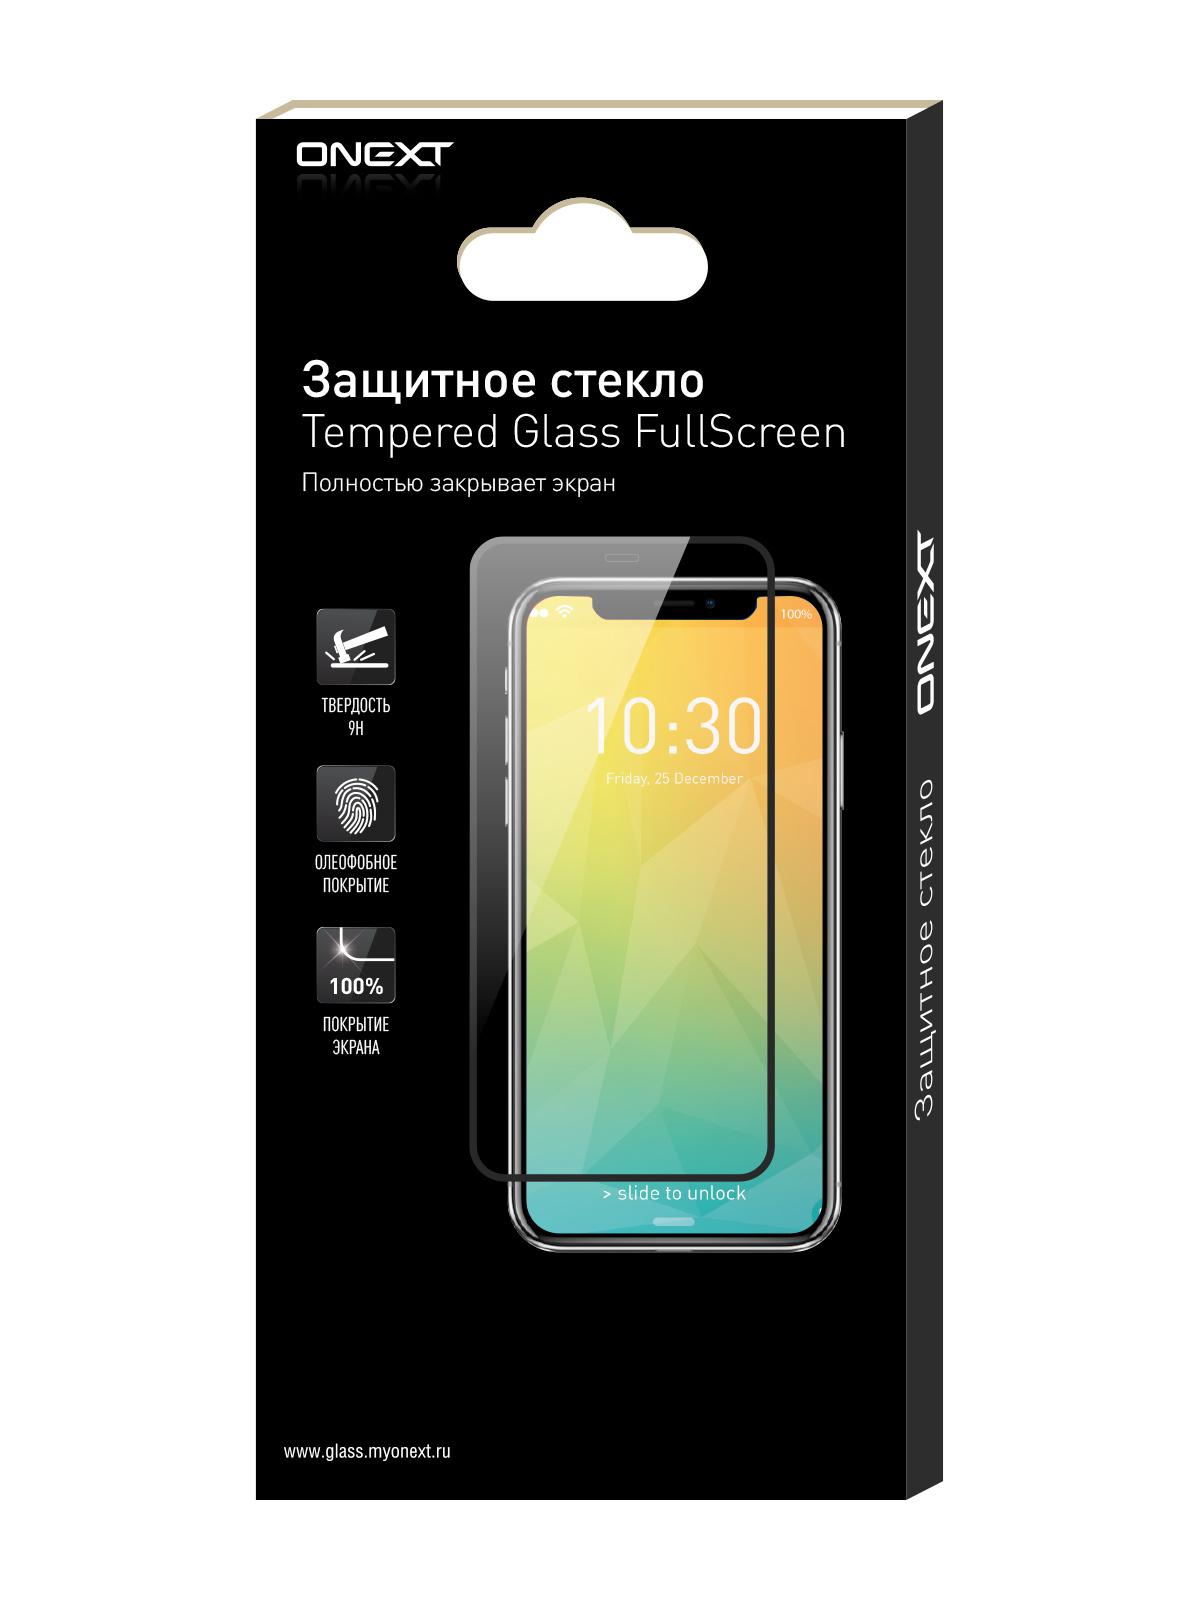 Защитное стекло ONEXT для Huawei Honor 9 Lite Blue